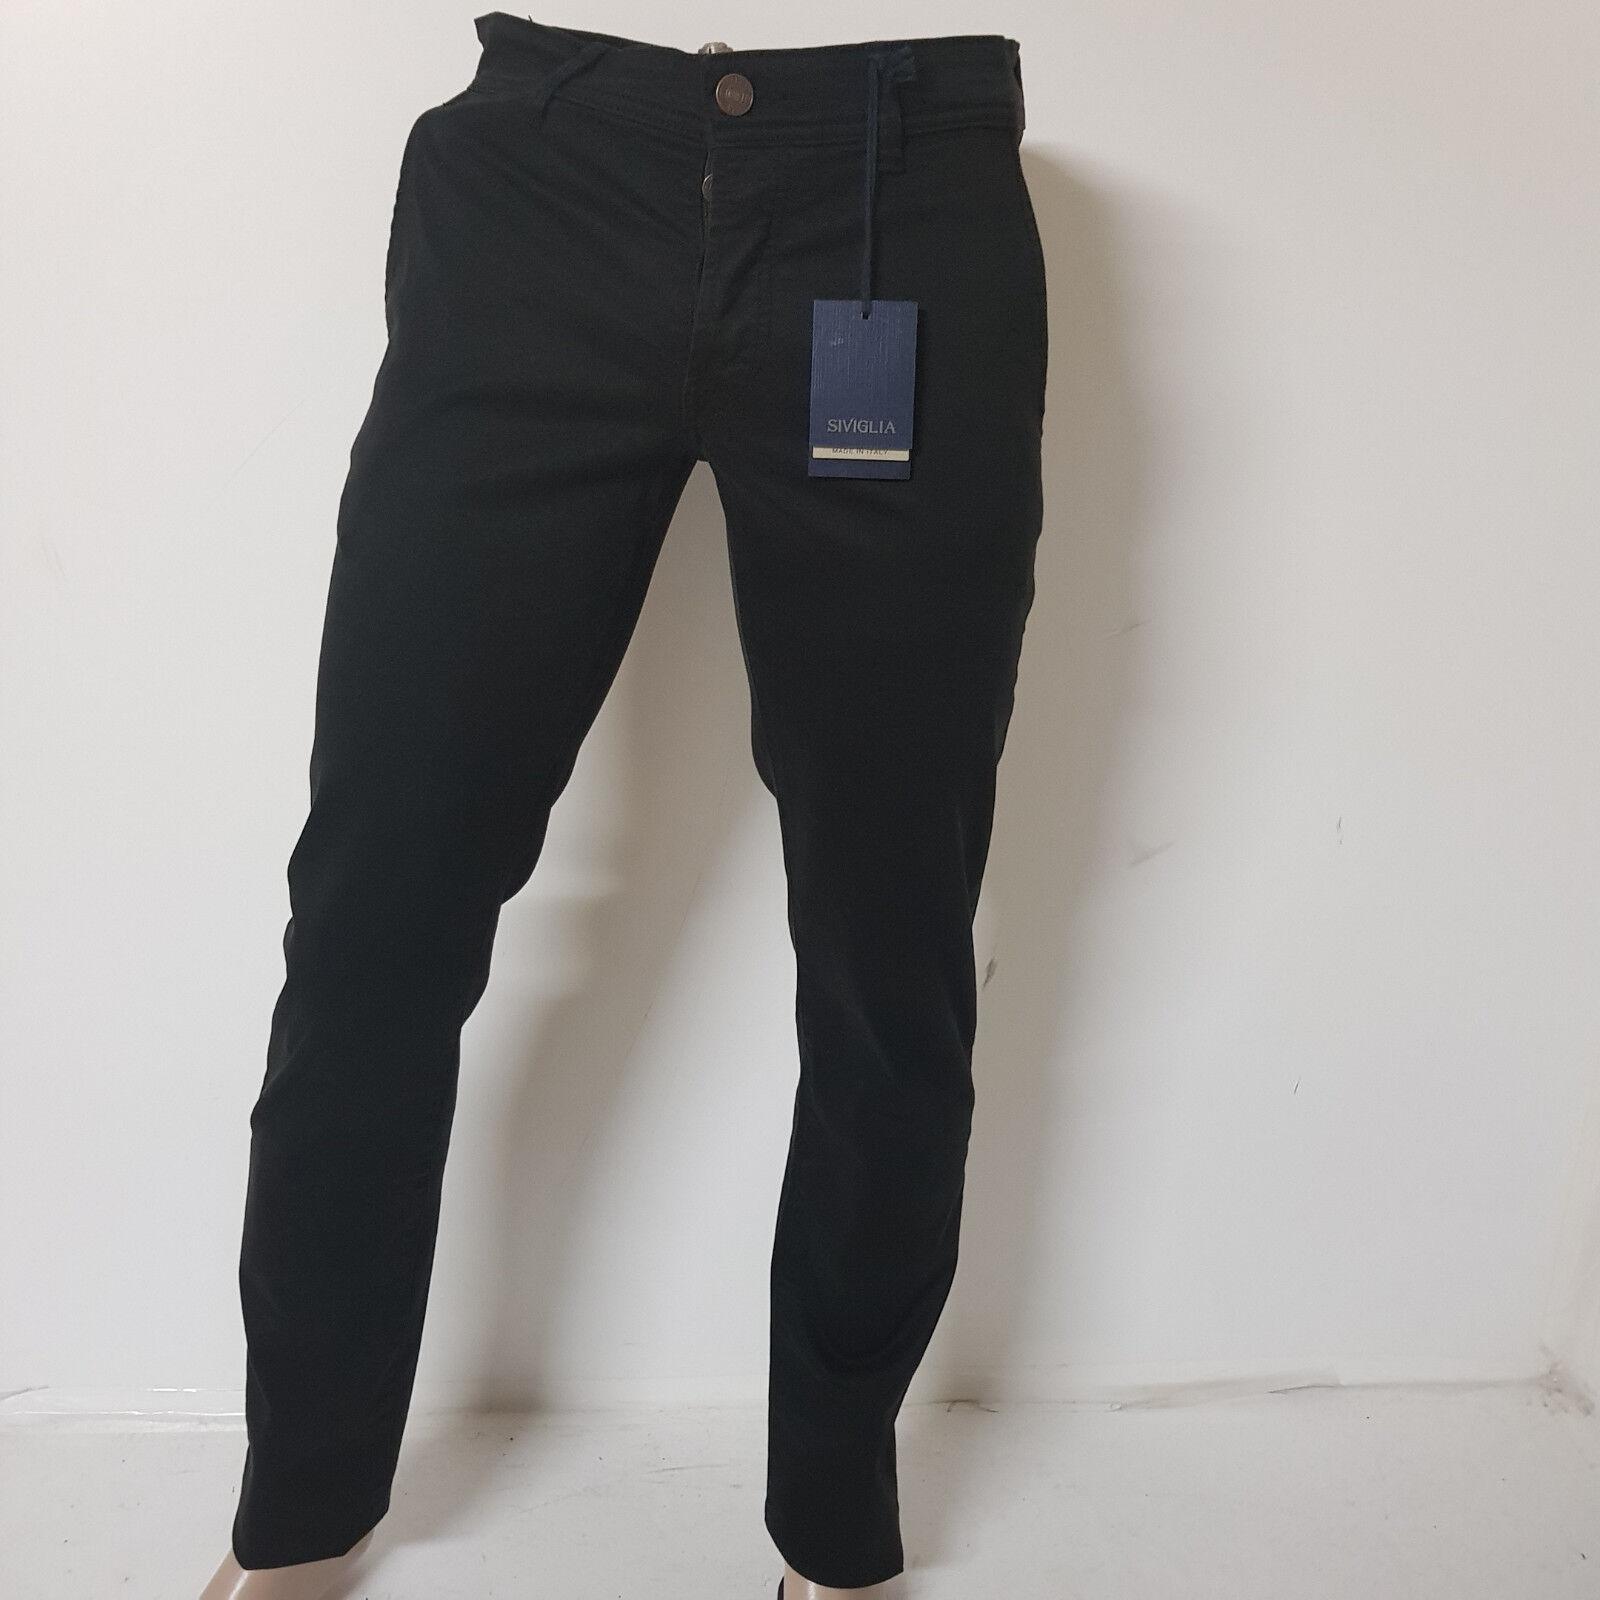 Pantalone Siviglia men   Pants men Art. -S - P024 U 1001 A-015  - Sconto - 60%